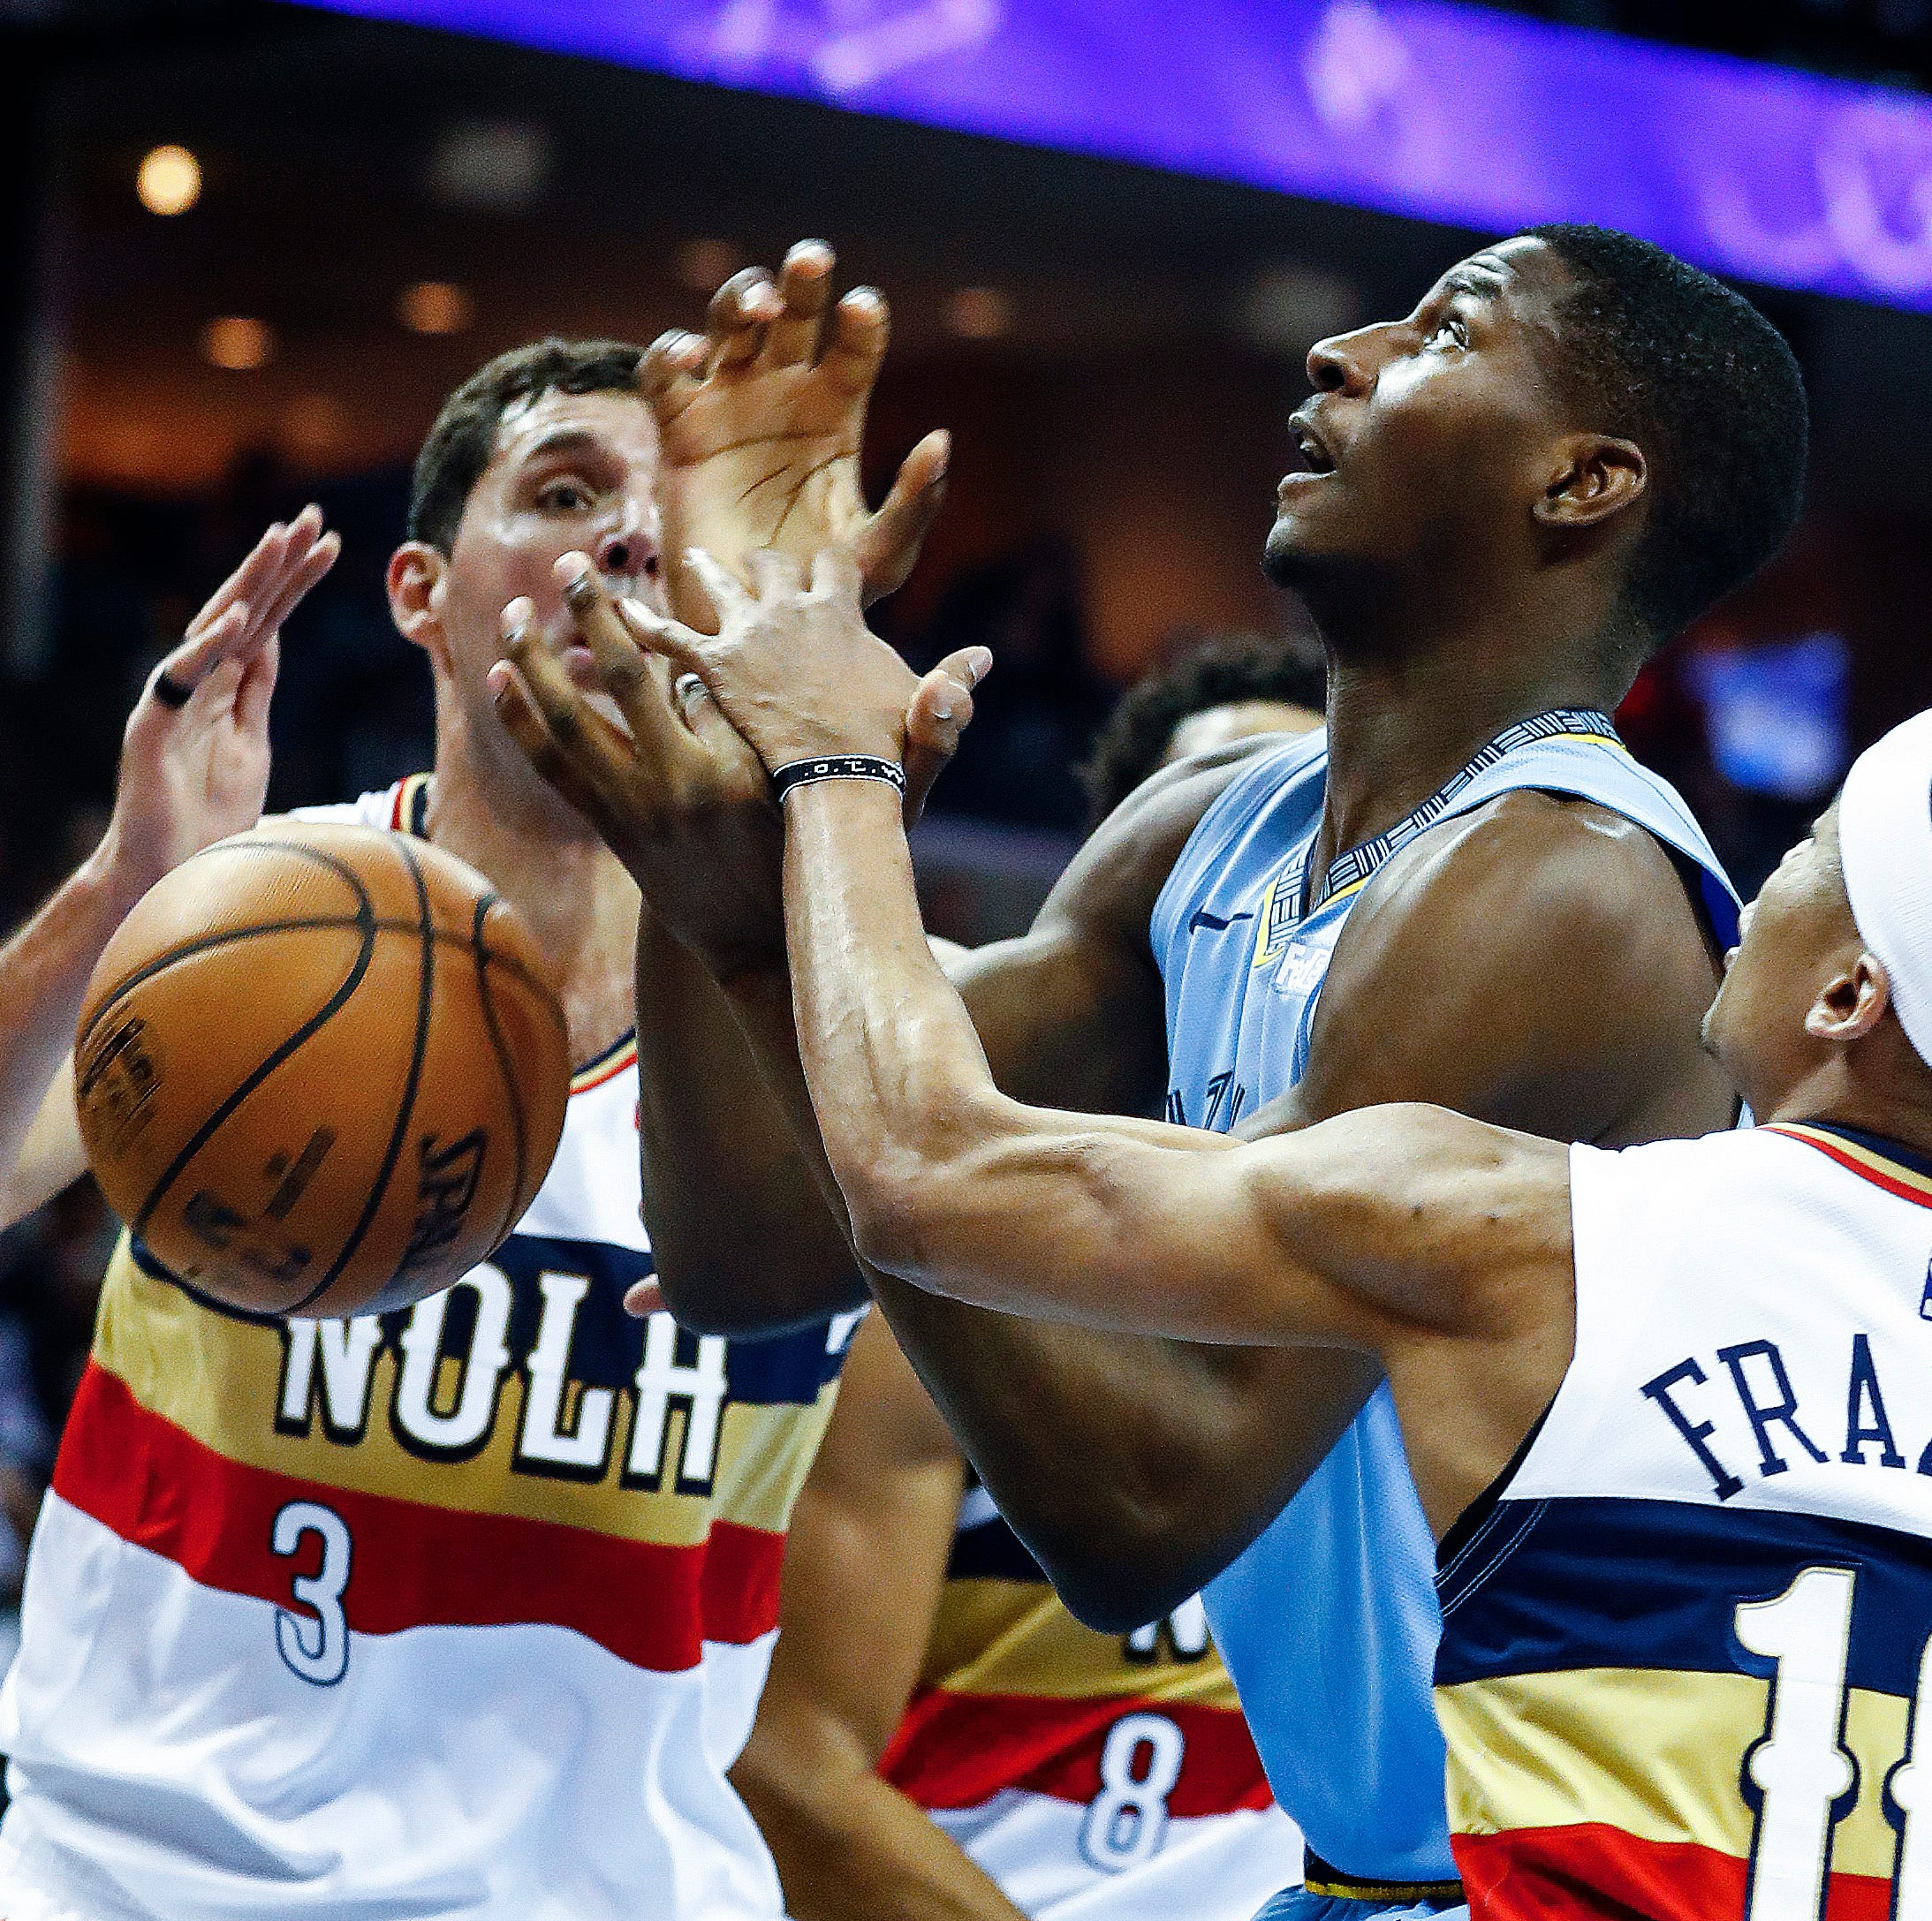 Game Recap: New Orleans Pelicans 105, Memphis Grizzlies 85